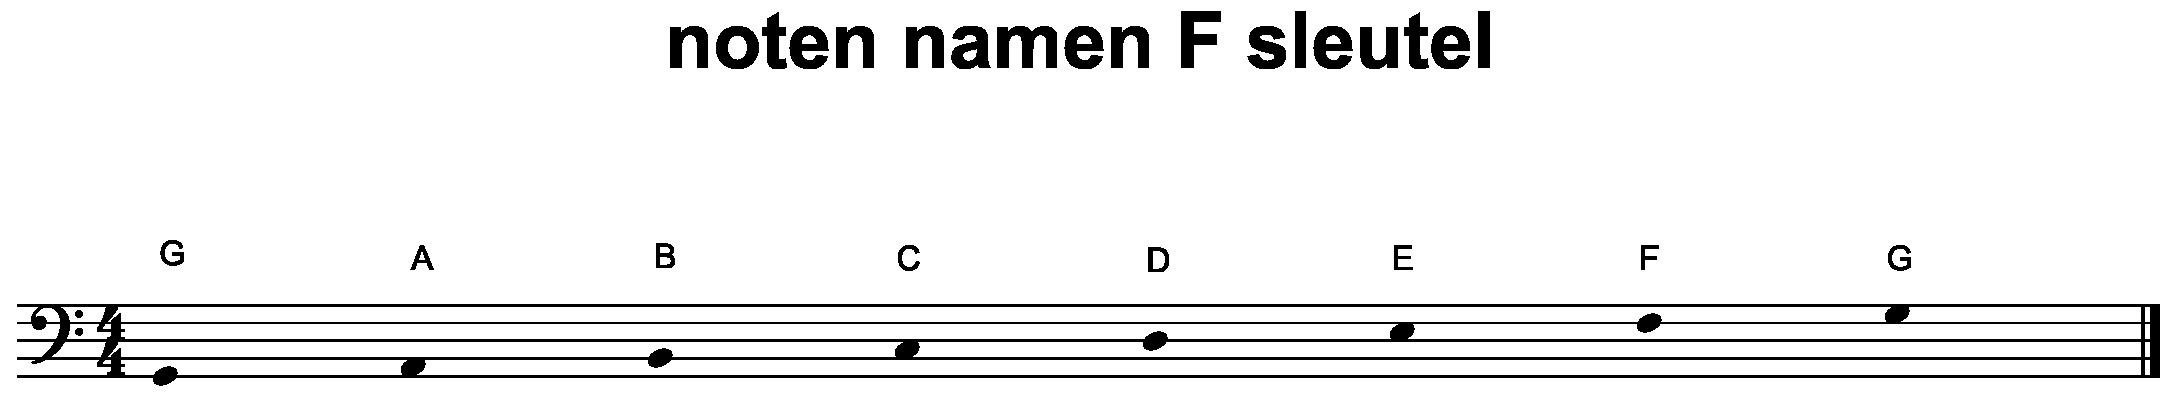 Theorieboek notennamen F sleutel